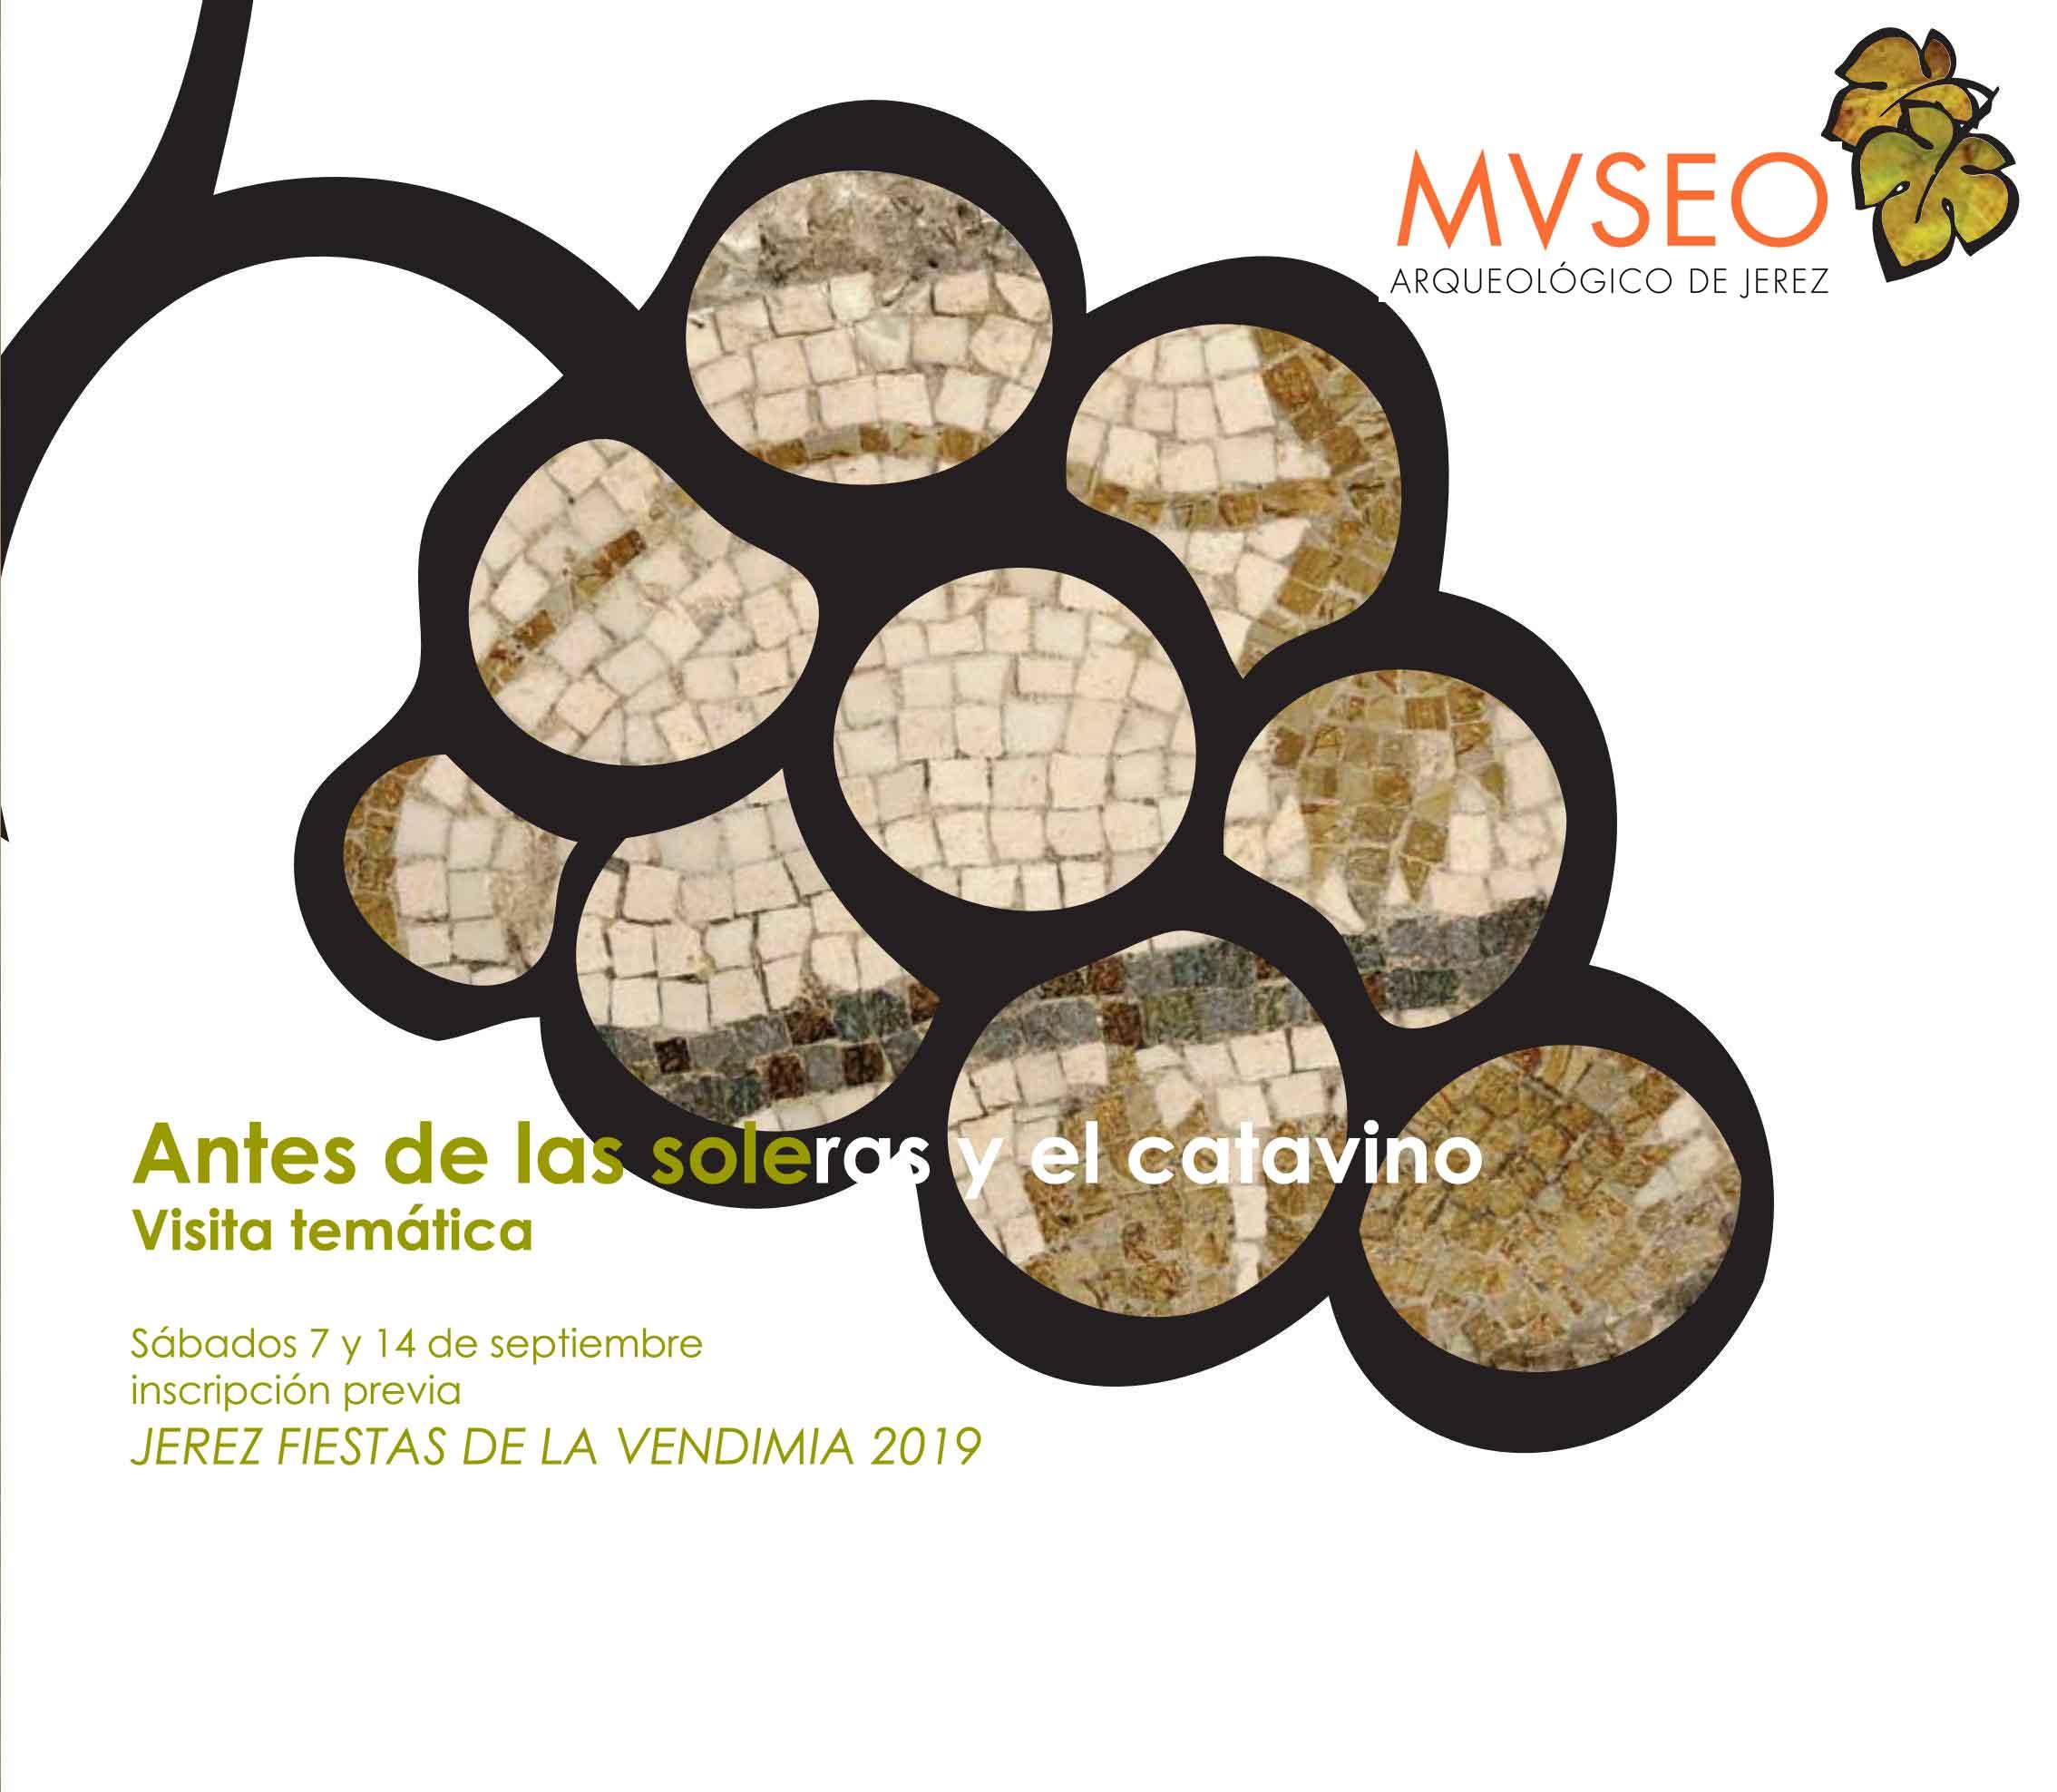 Visita temática del vino de Jerez